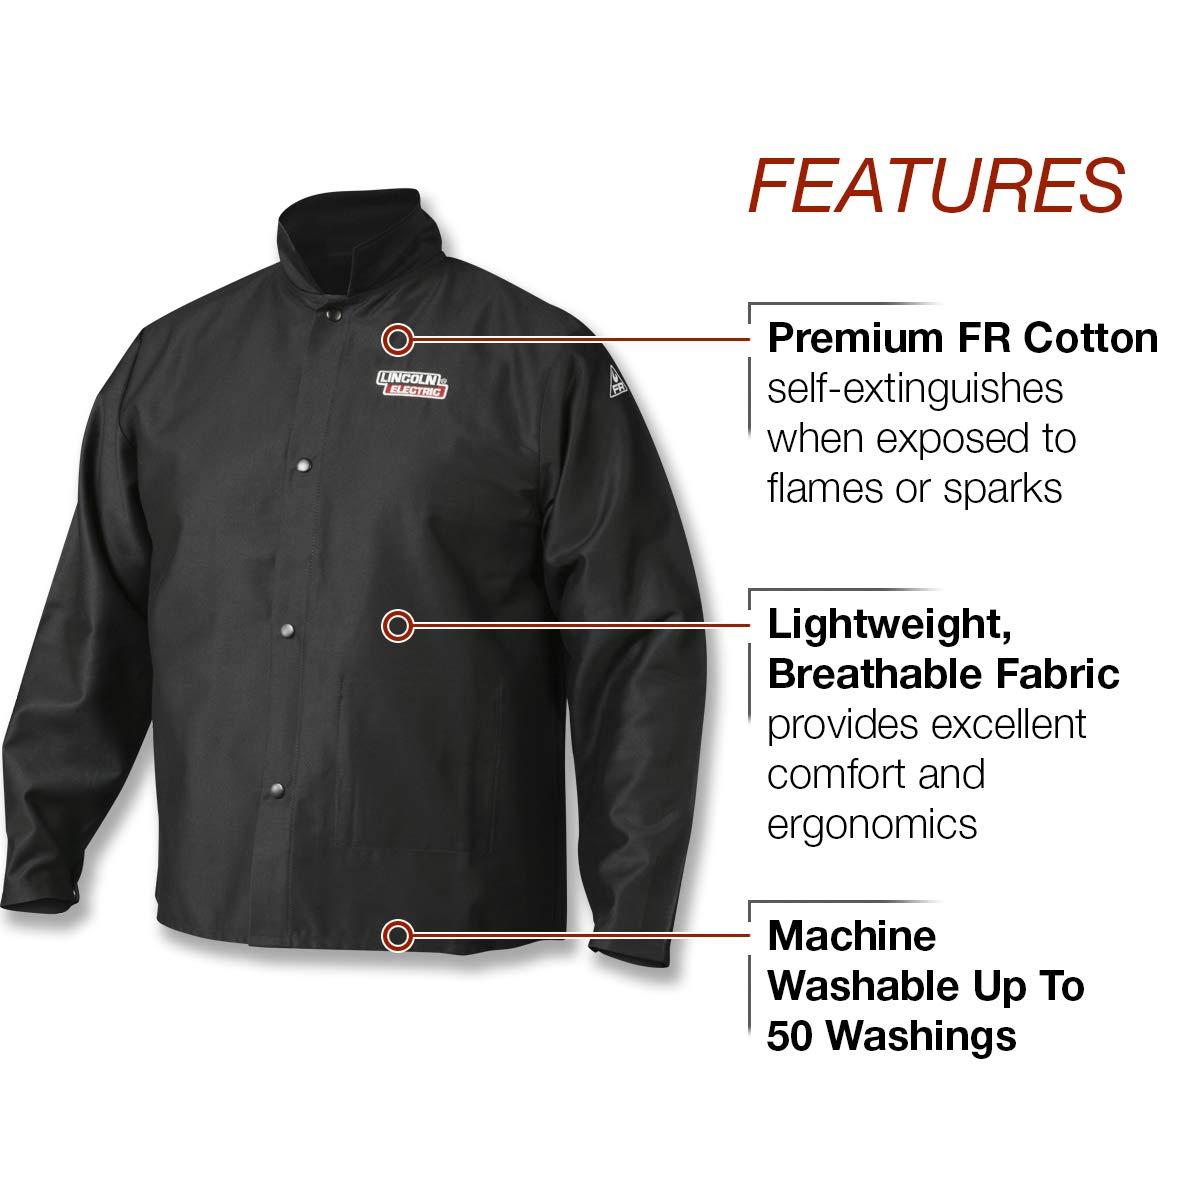 Lincoln Electric  Premium Flame Resistant (FR) Cotton Welding Jacket | Comfortable | Black | XXXL | K2985-XXXL by Lincoln Electric (Image #2)